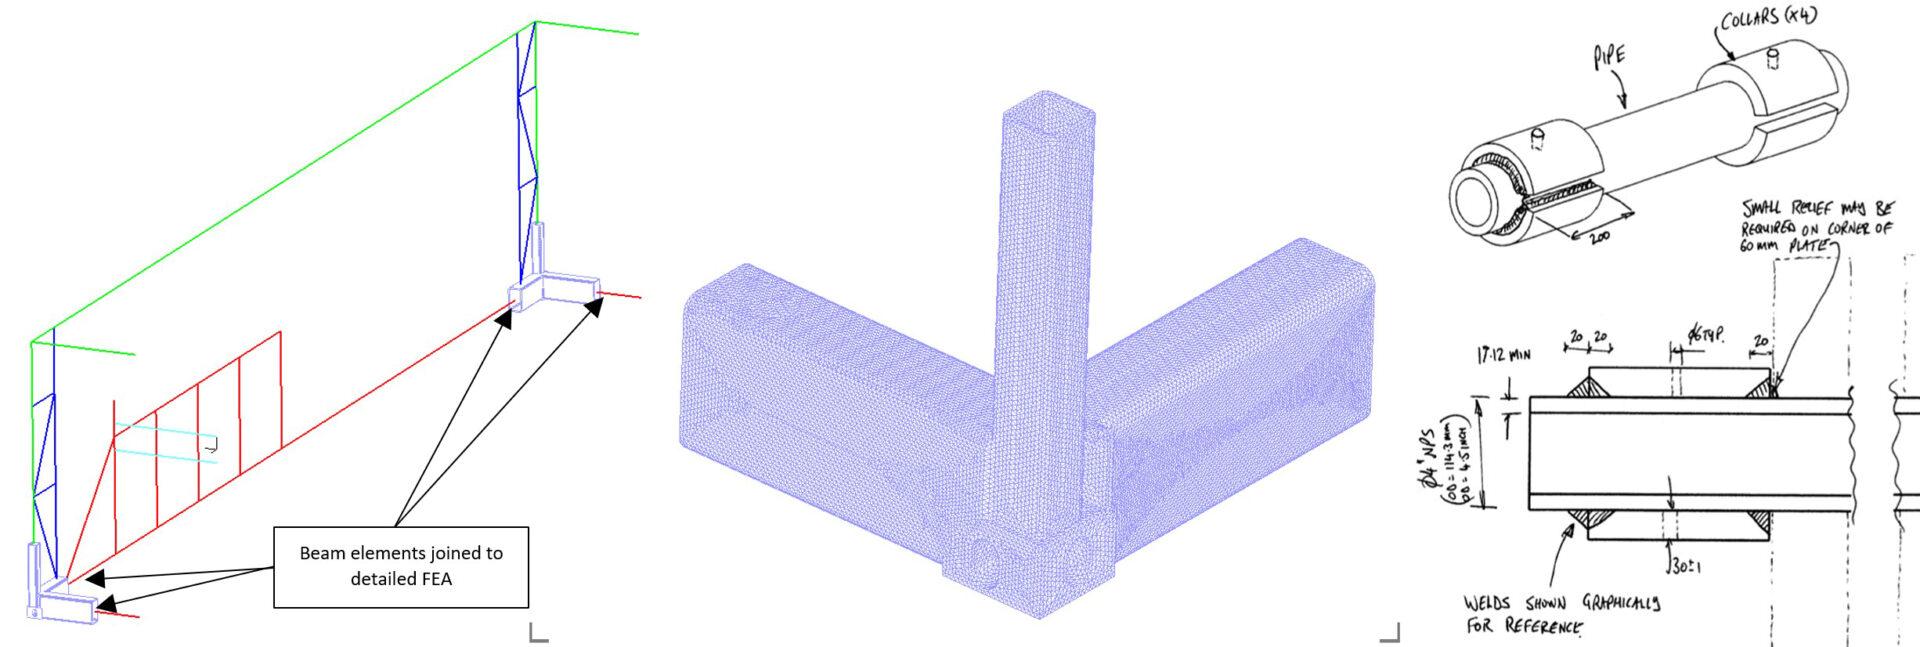 Design-with-sim-9014FE-1